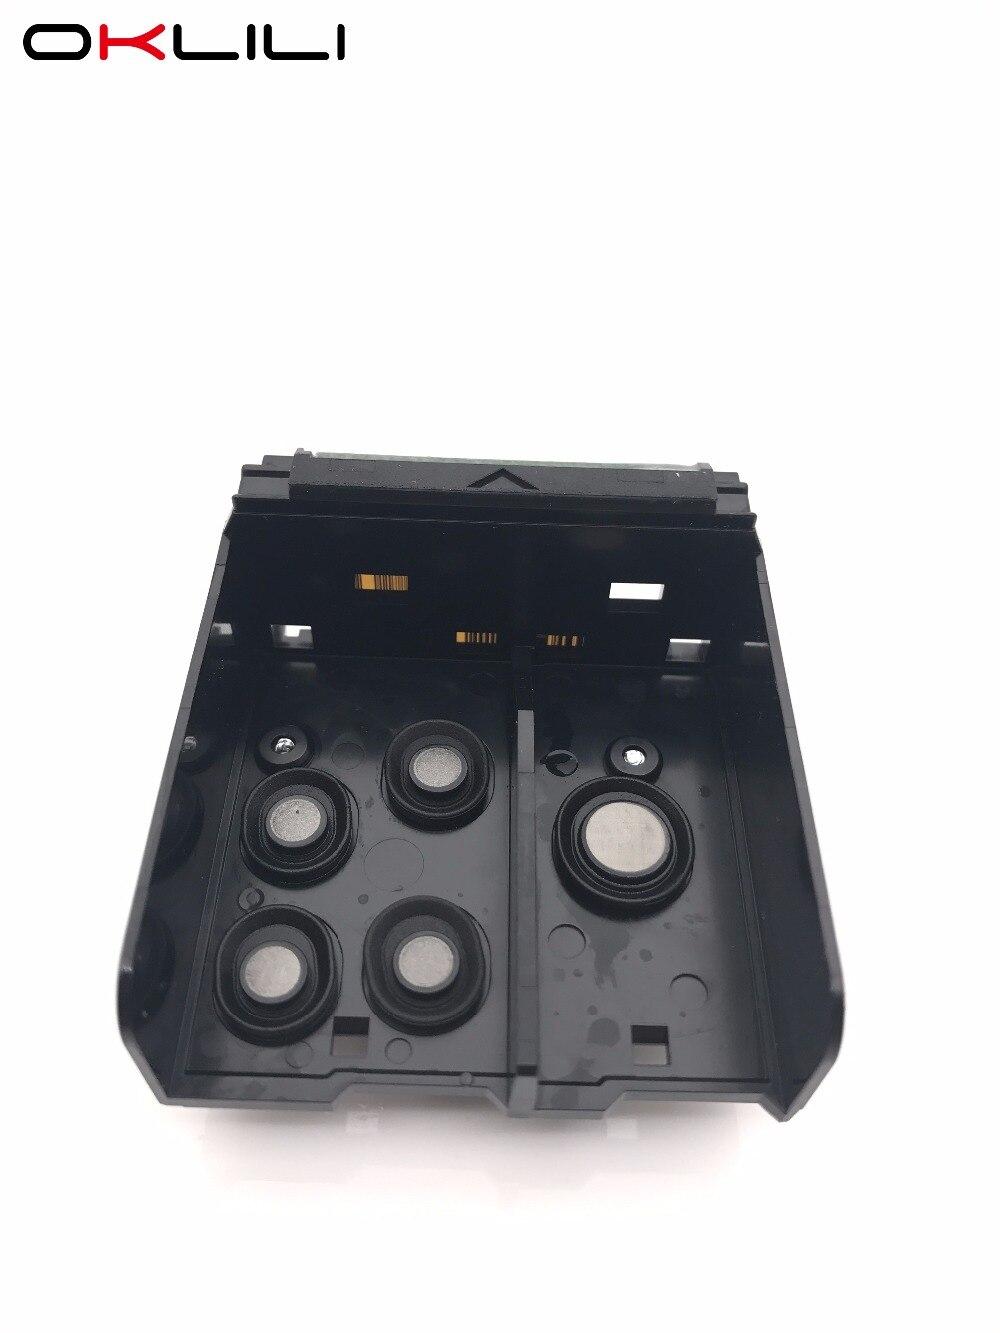 OKLILI ORIGINAL QY6 0068 QY6 0068 000 Printhead Print Head Printer Head for Canon PIXMA iP100